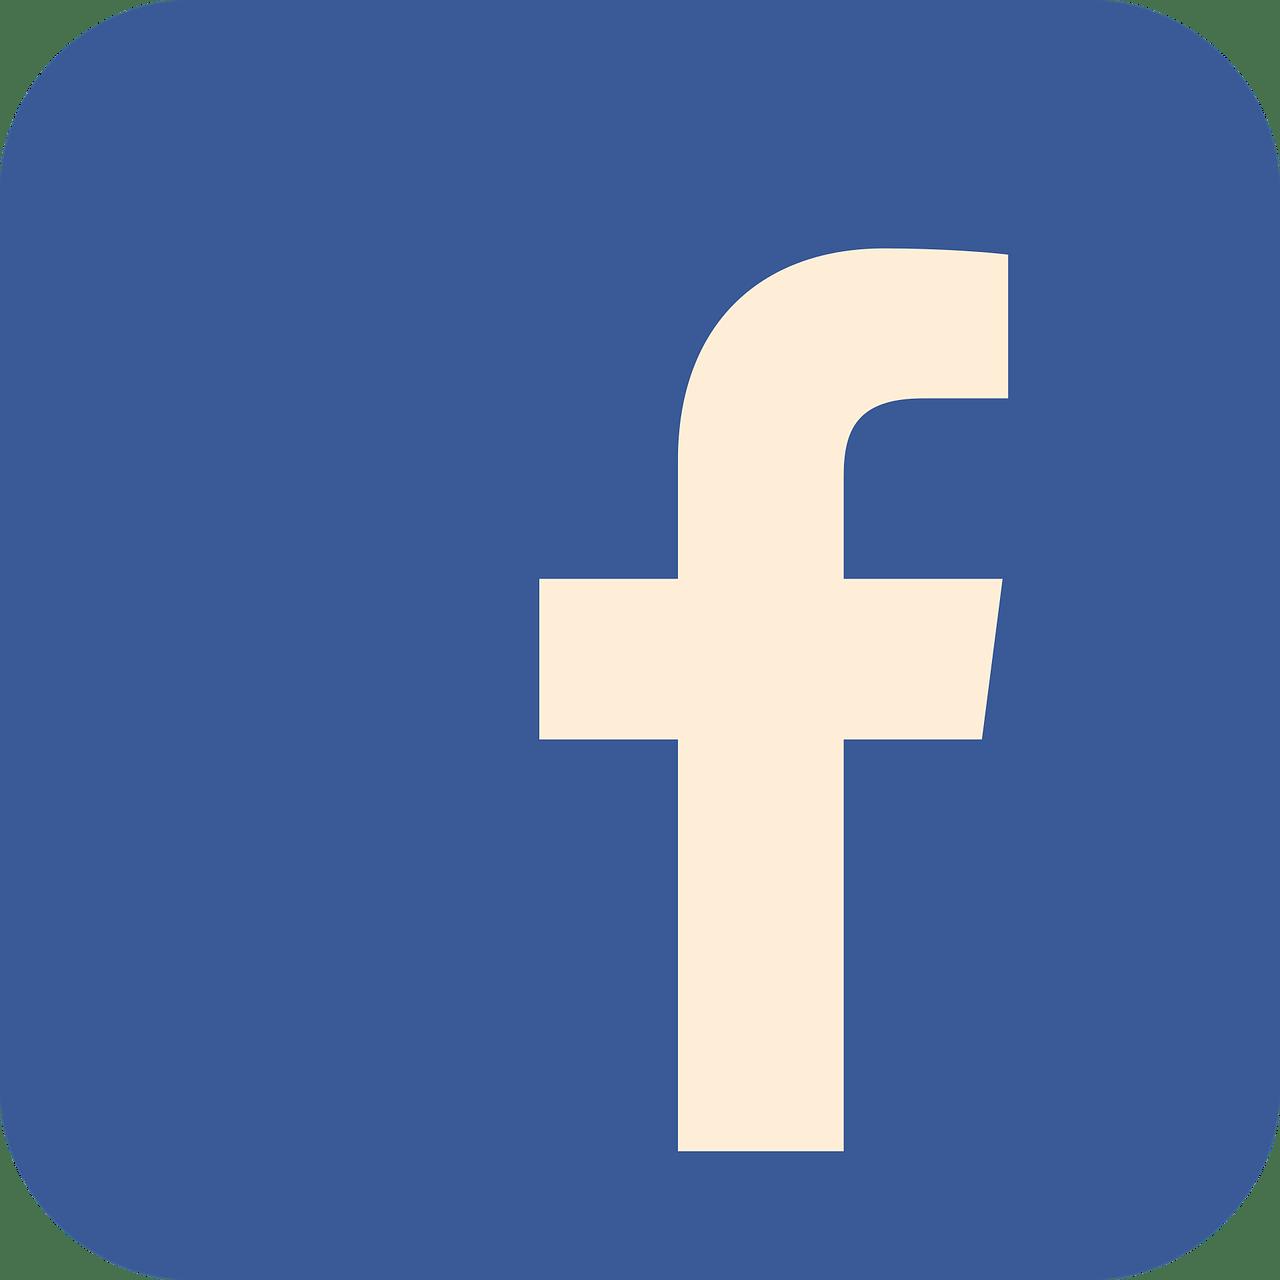 Facebook創設者マーク・ザッカーバーグの知られざる成長記録を公開!